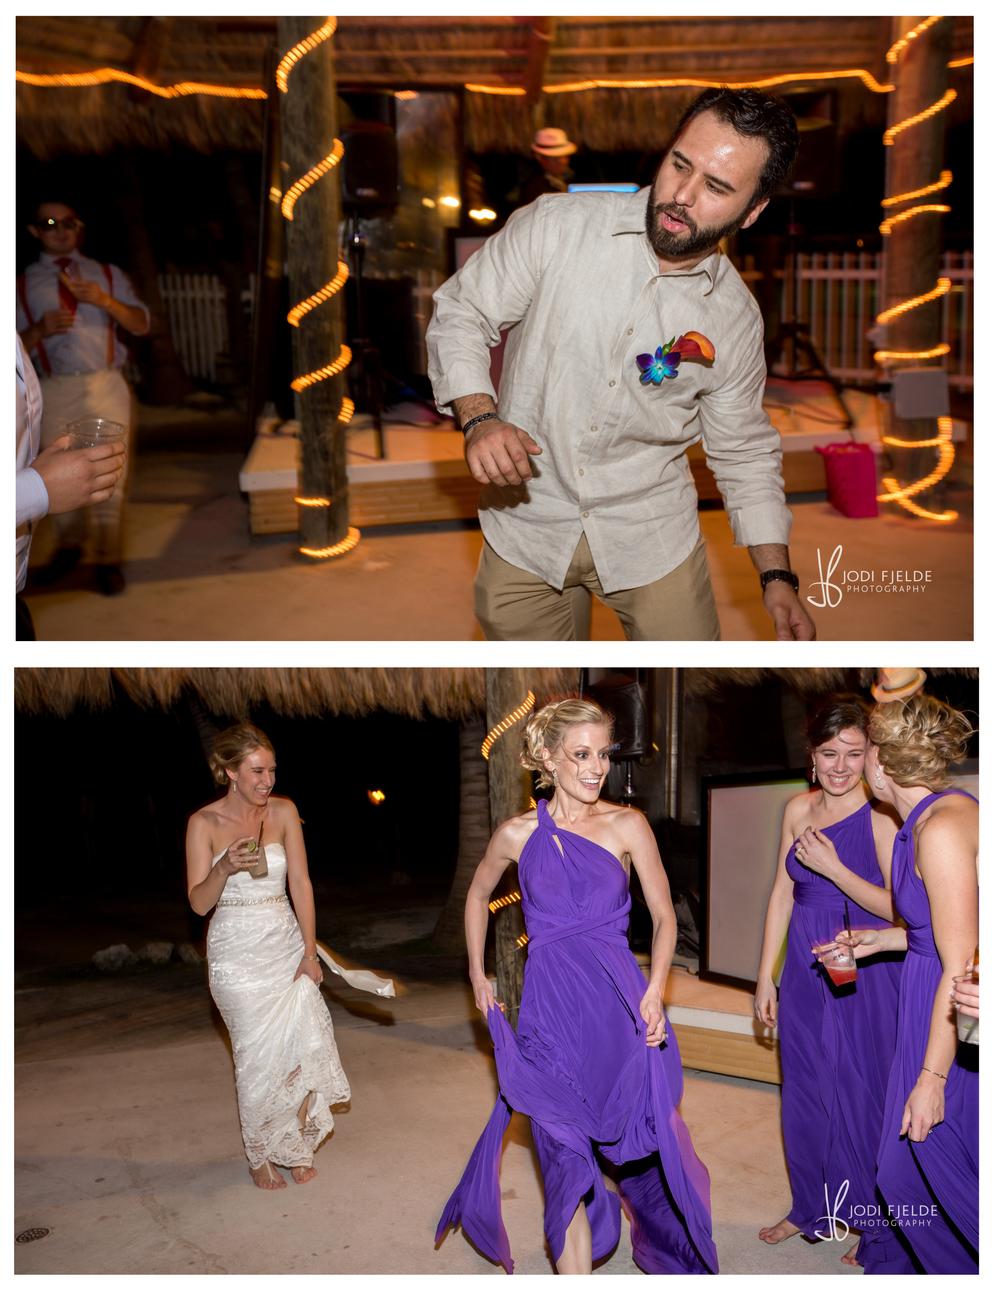 Cocconut_Cove_&_ Marina_ wedding_Kayla_and_Patrick 39.jpg